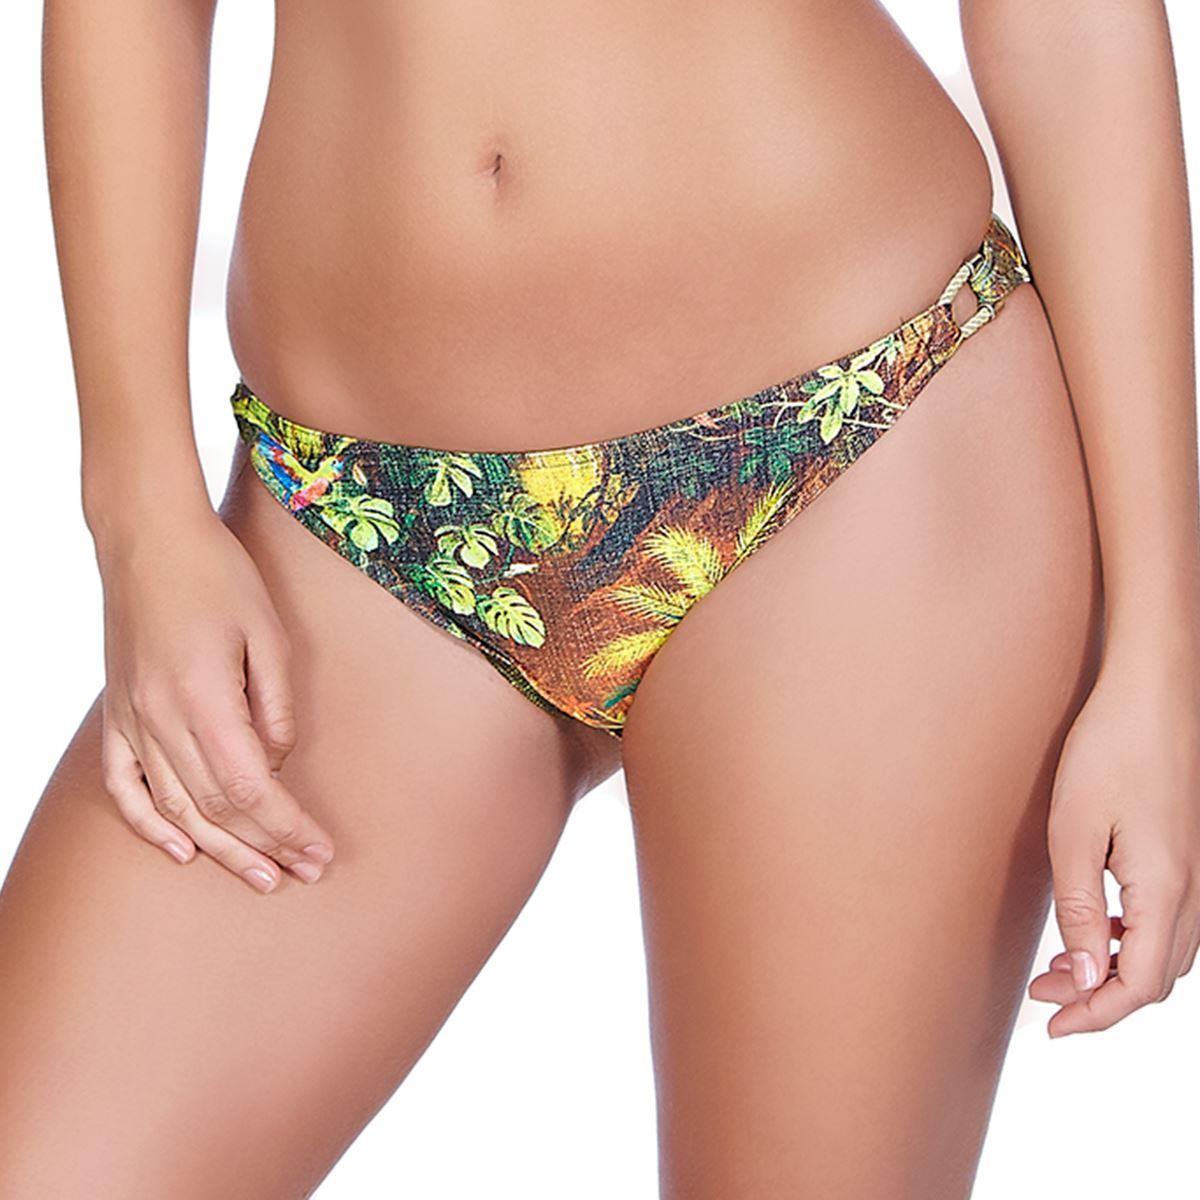 Freya Wilderness Rio Bikini Brief - Tropic